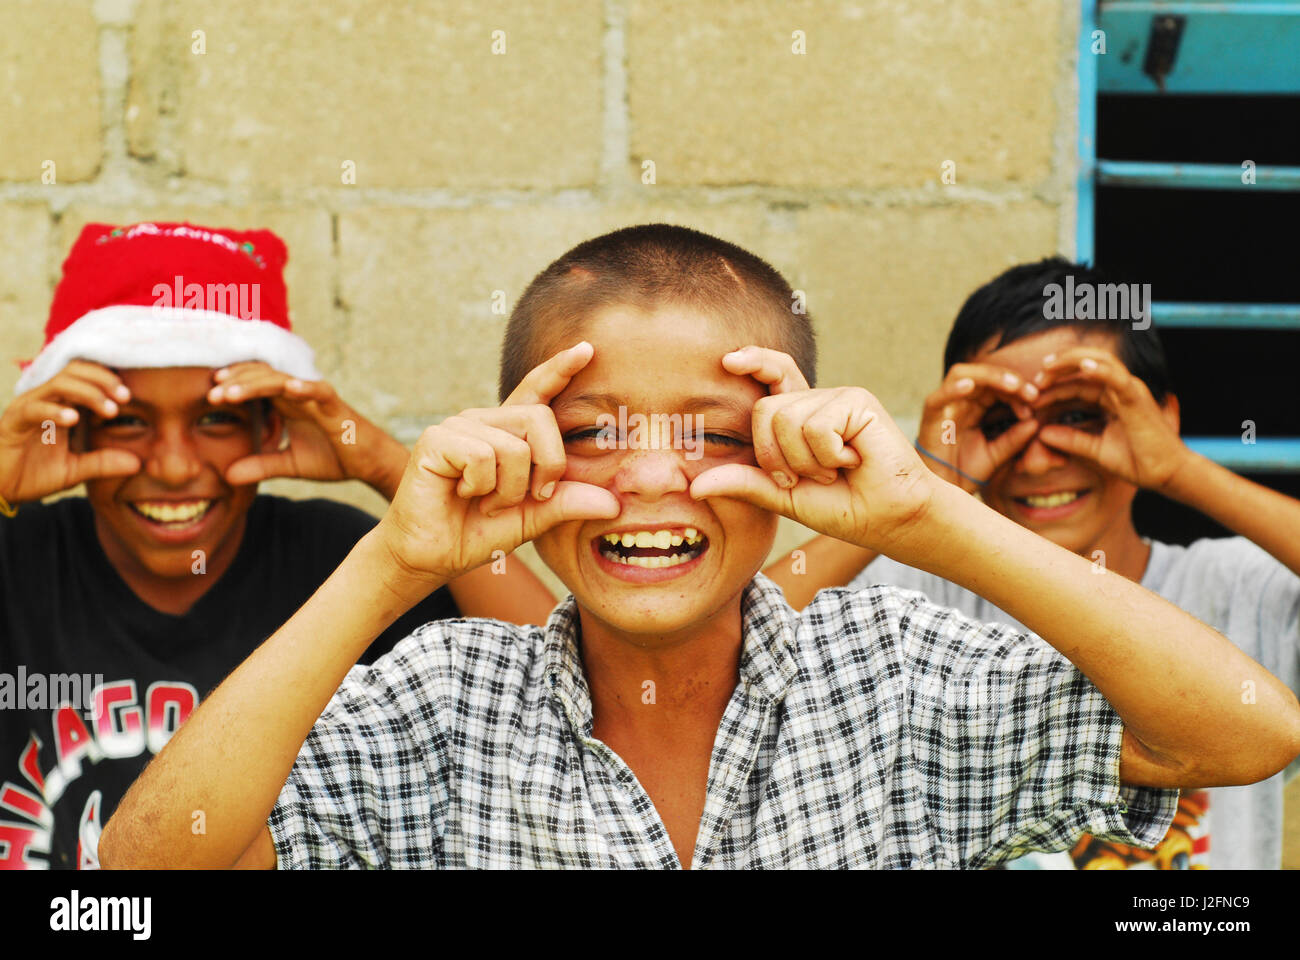 Belize, El Progreso, 3 Freunde in der Schule Stockbild